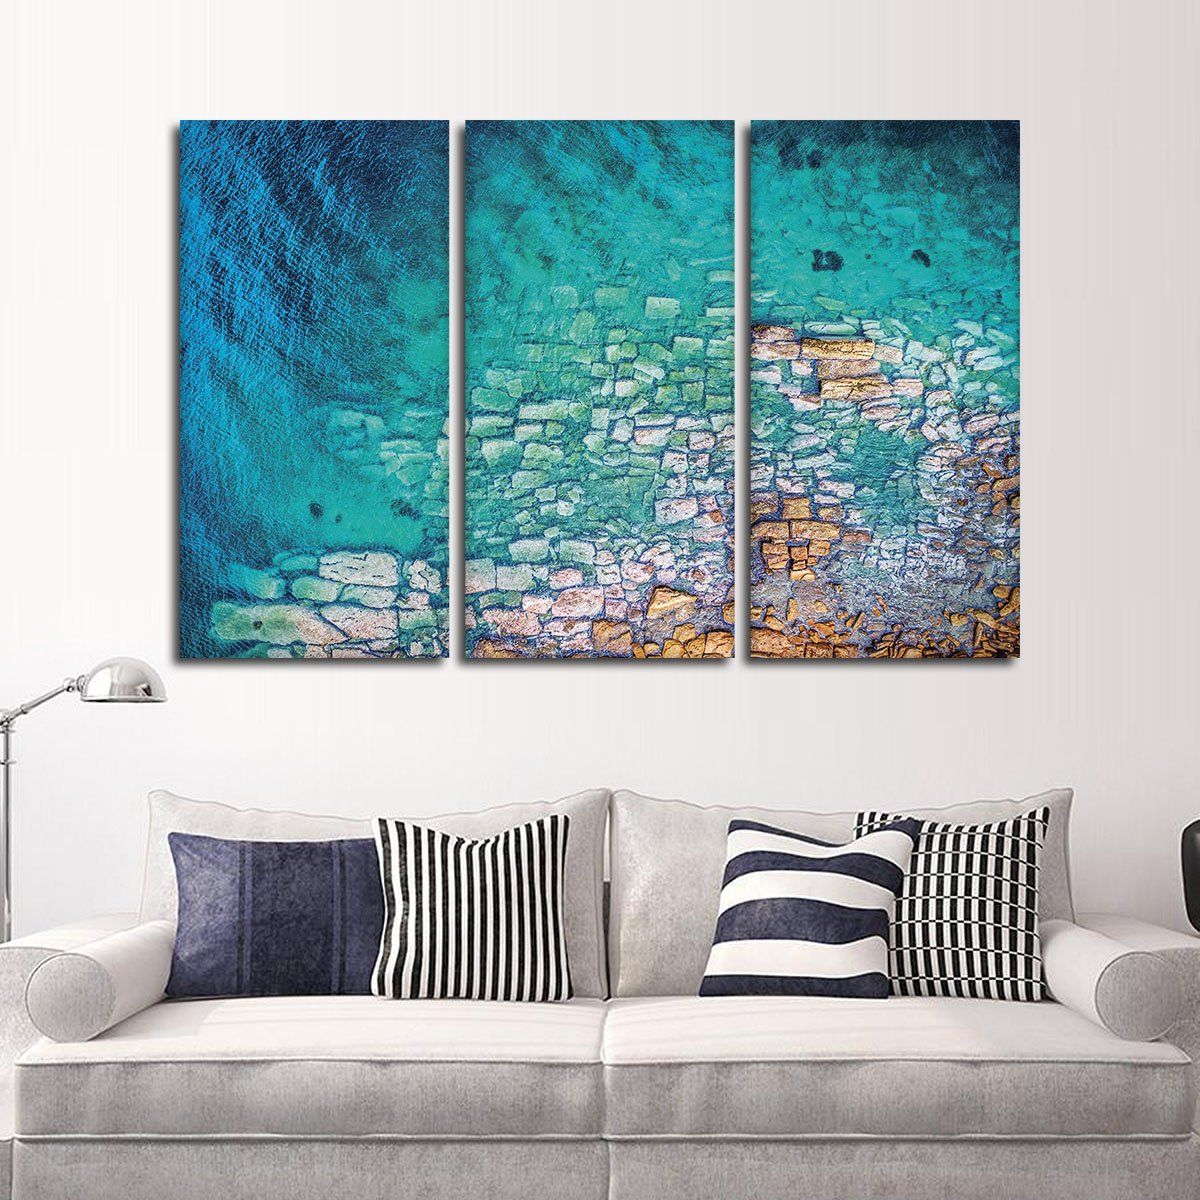 Aerial Ocean View Multi Panel Canvas Wall Art Wall Decor Painting Canvas Canvas Wall Art Islamic Wall Art